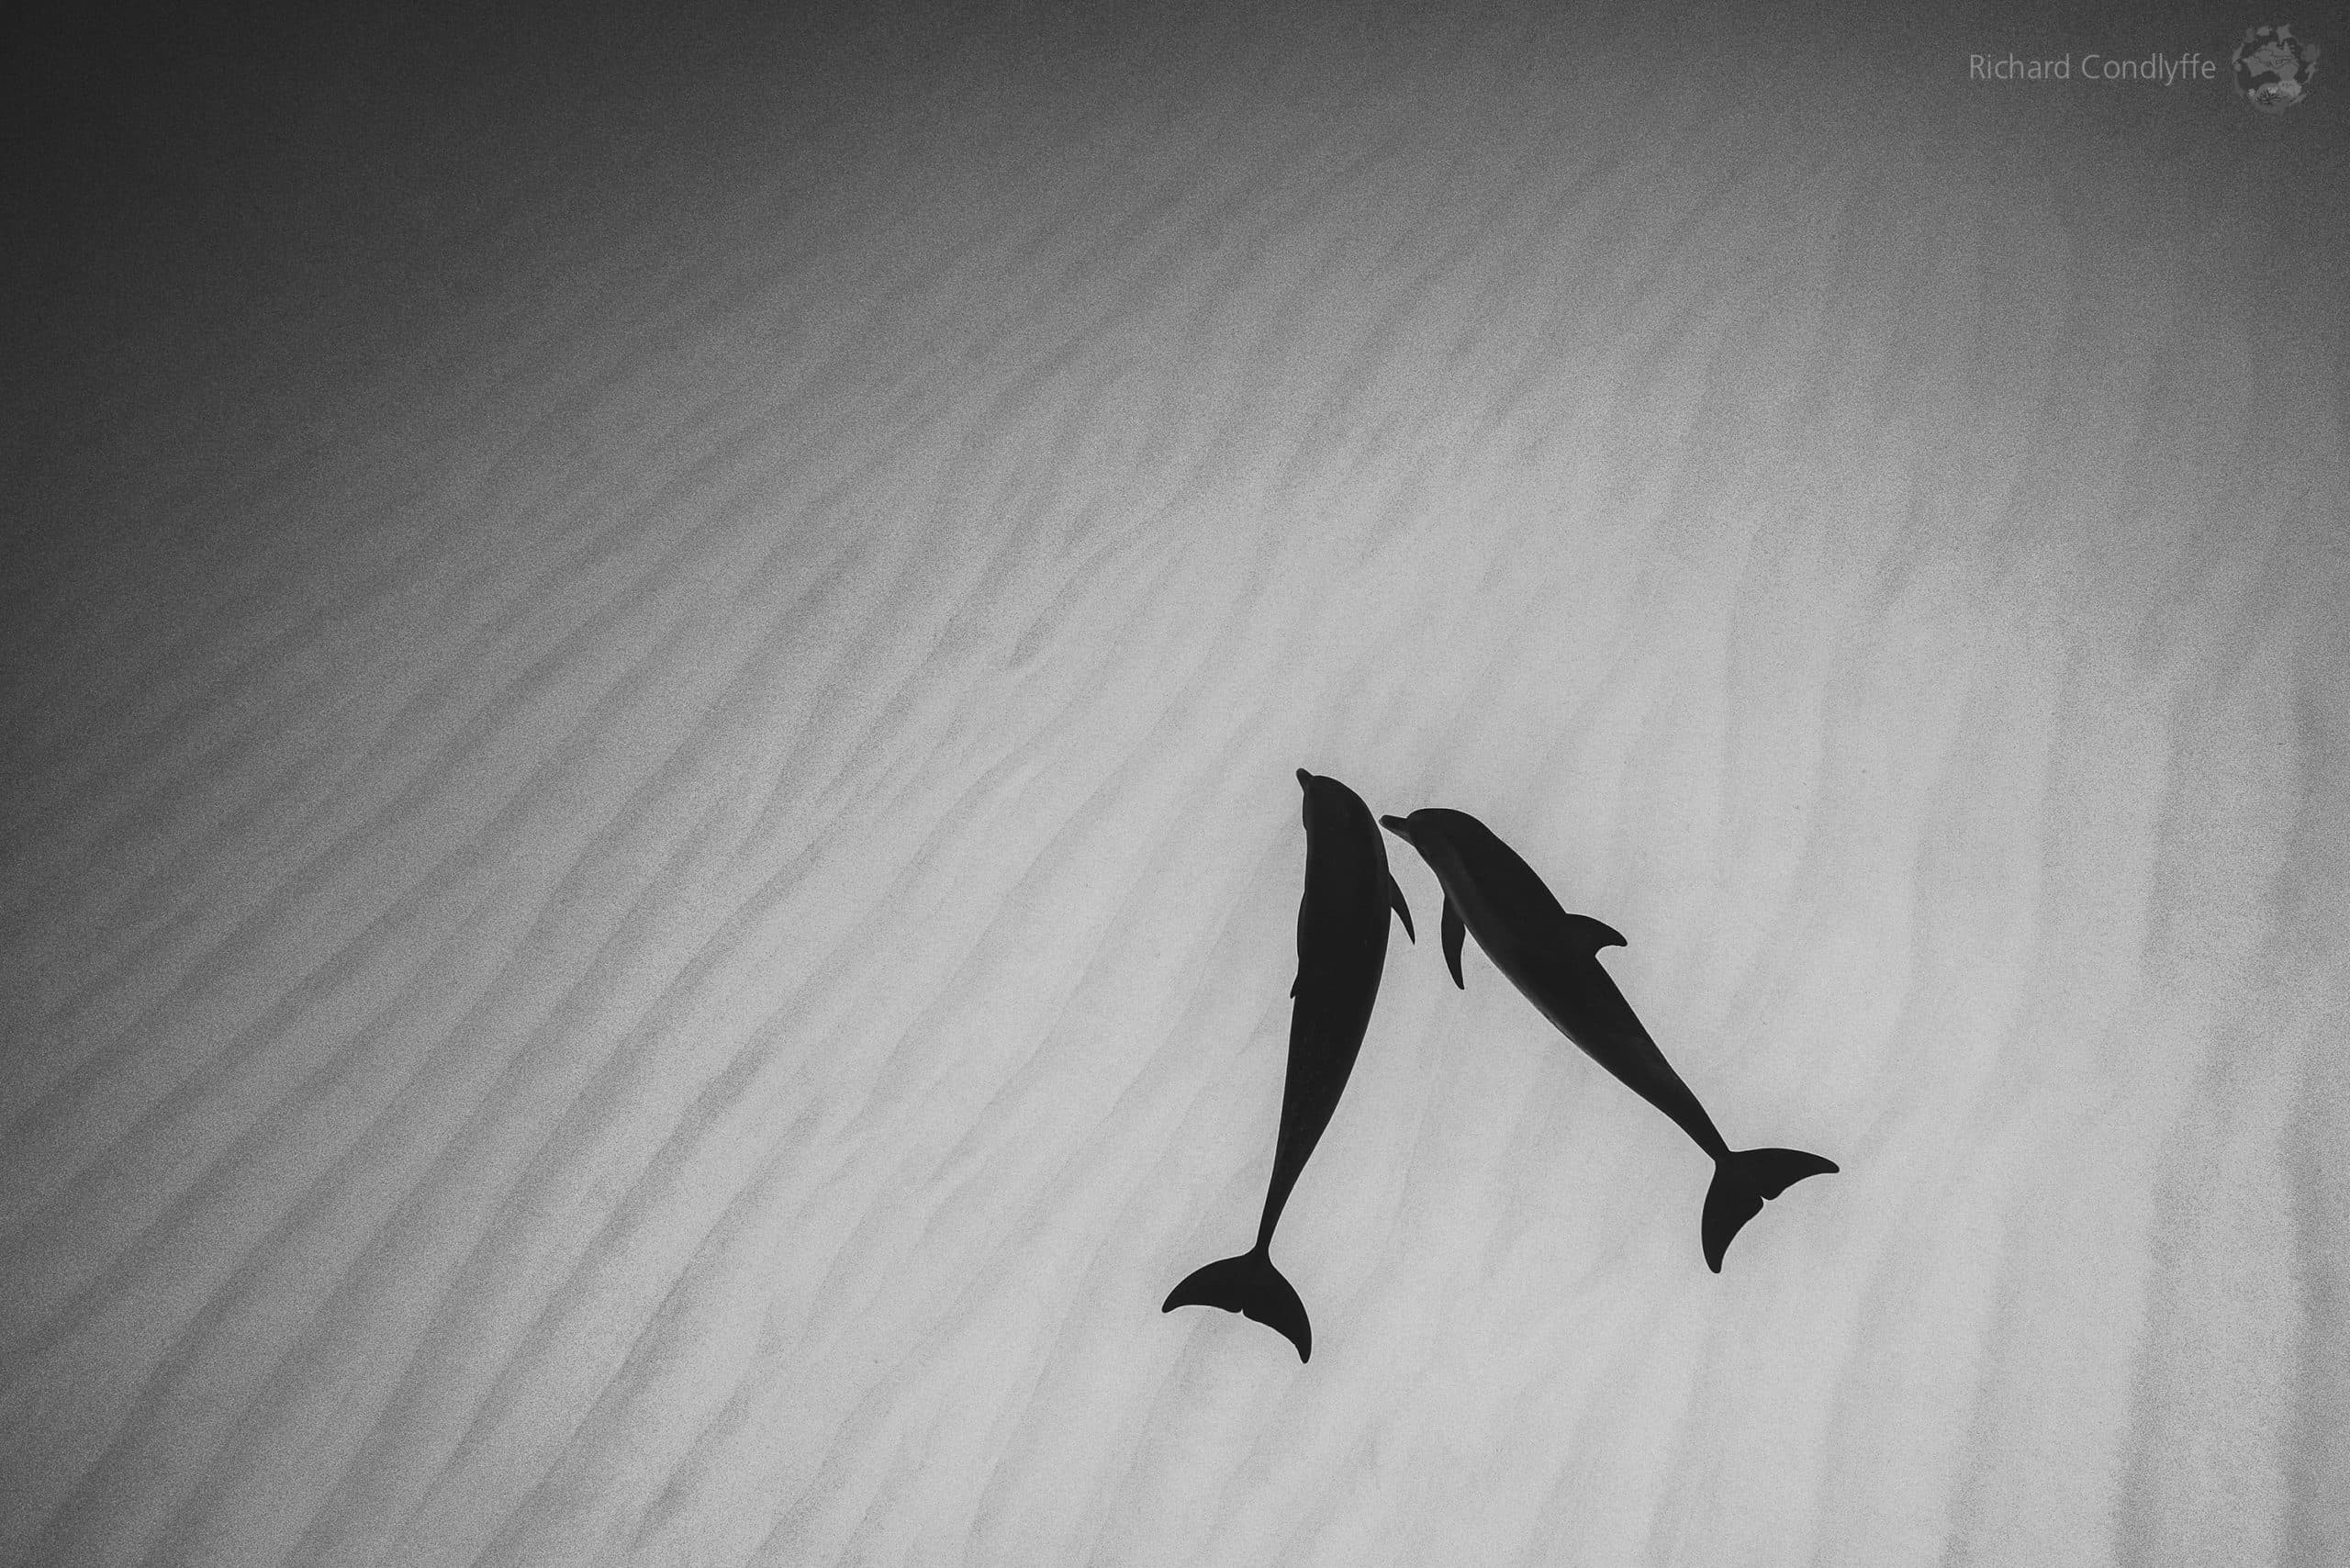 UnderWater Black And White, Richard Condlyffe